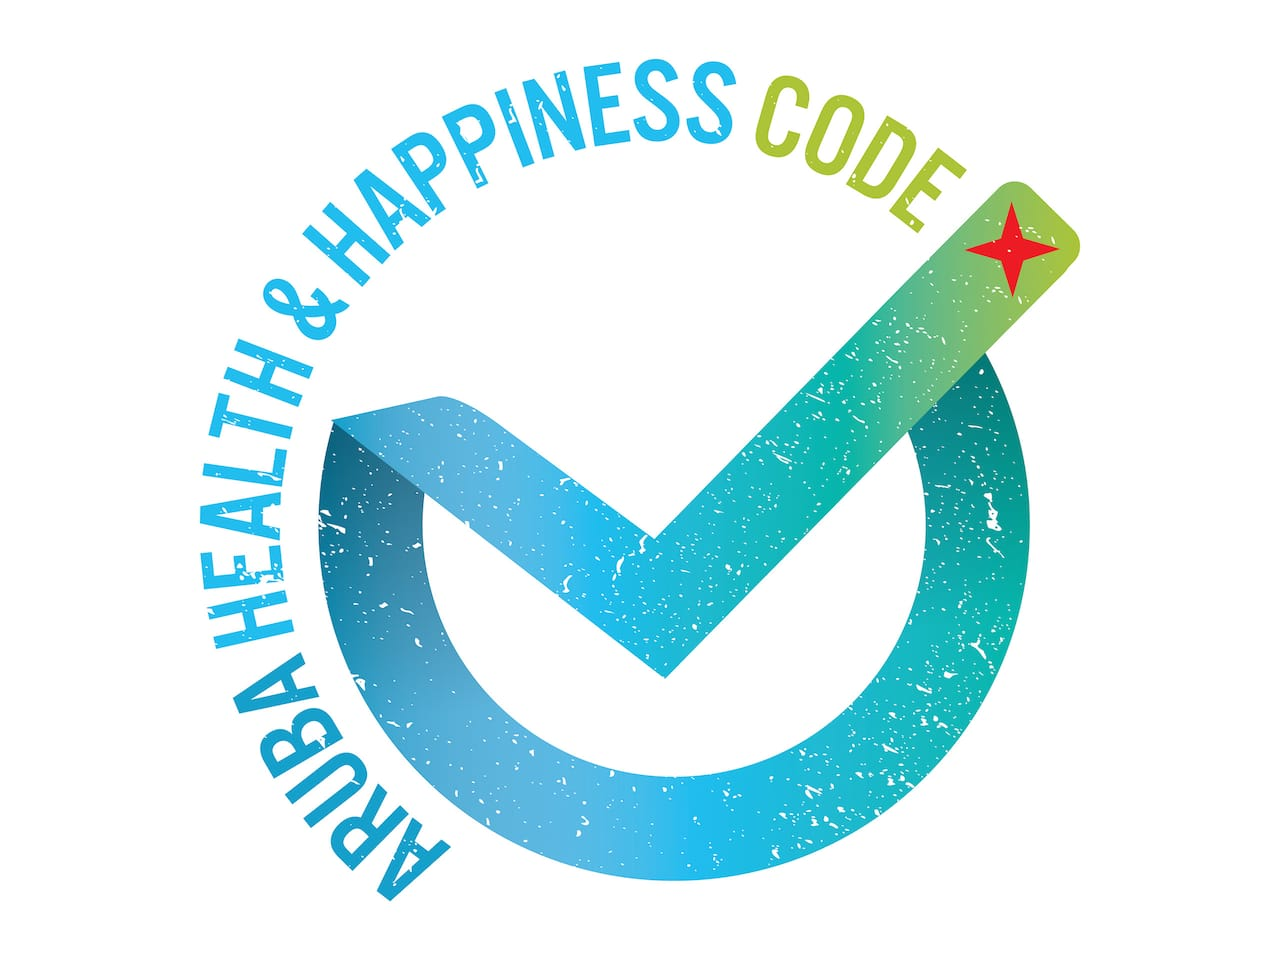 Aruba Health & Happiness Code Pre-Seal